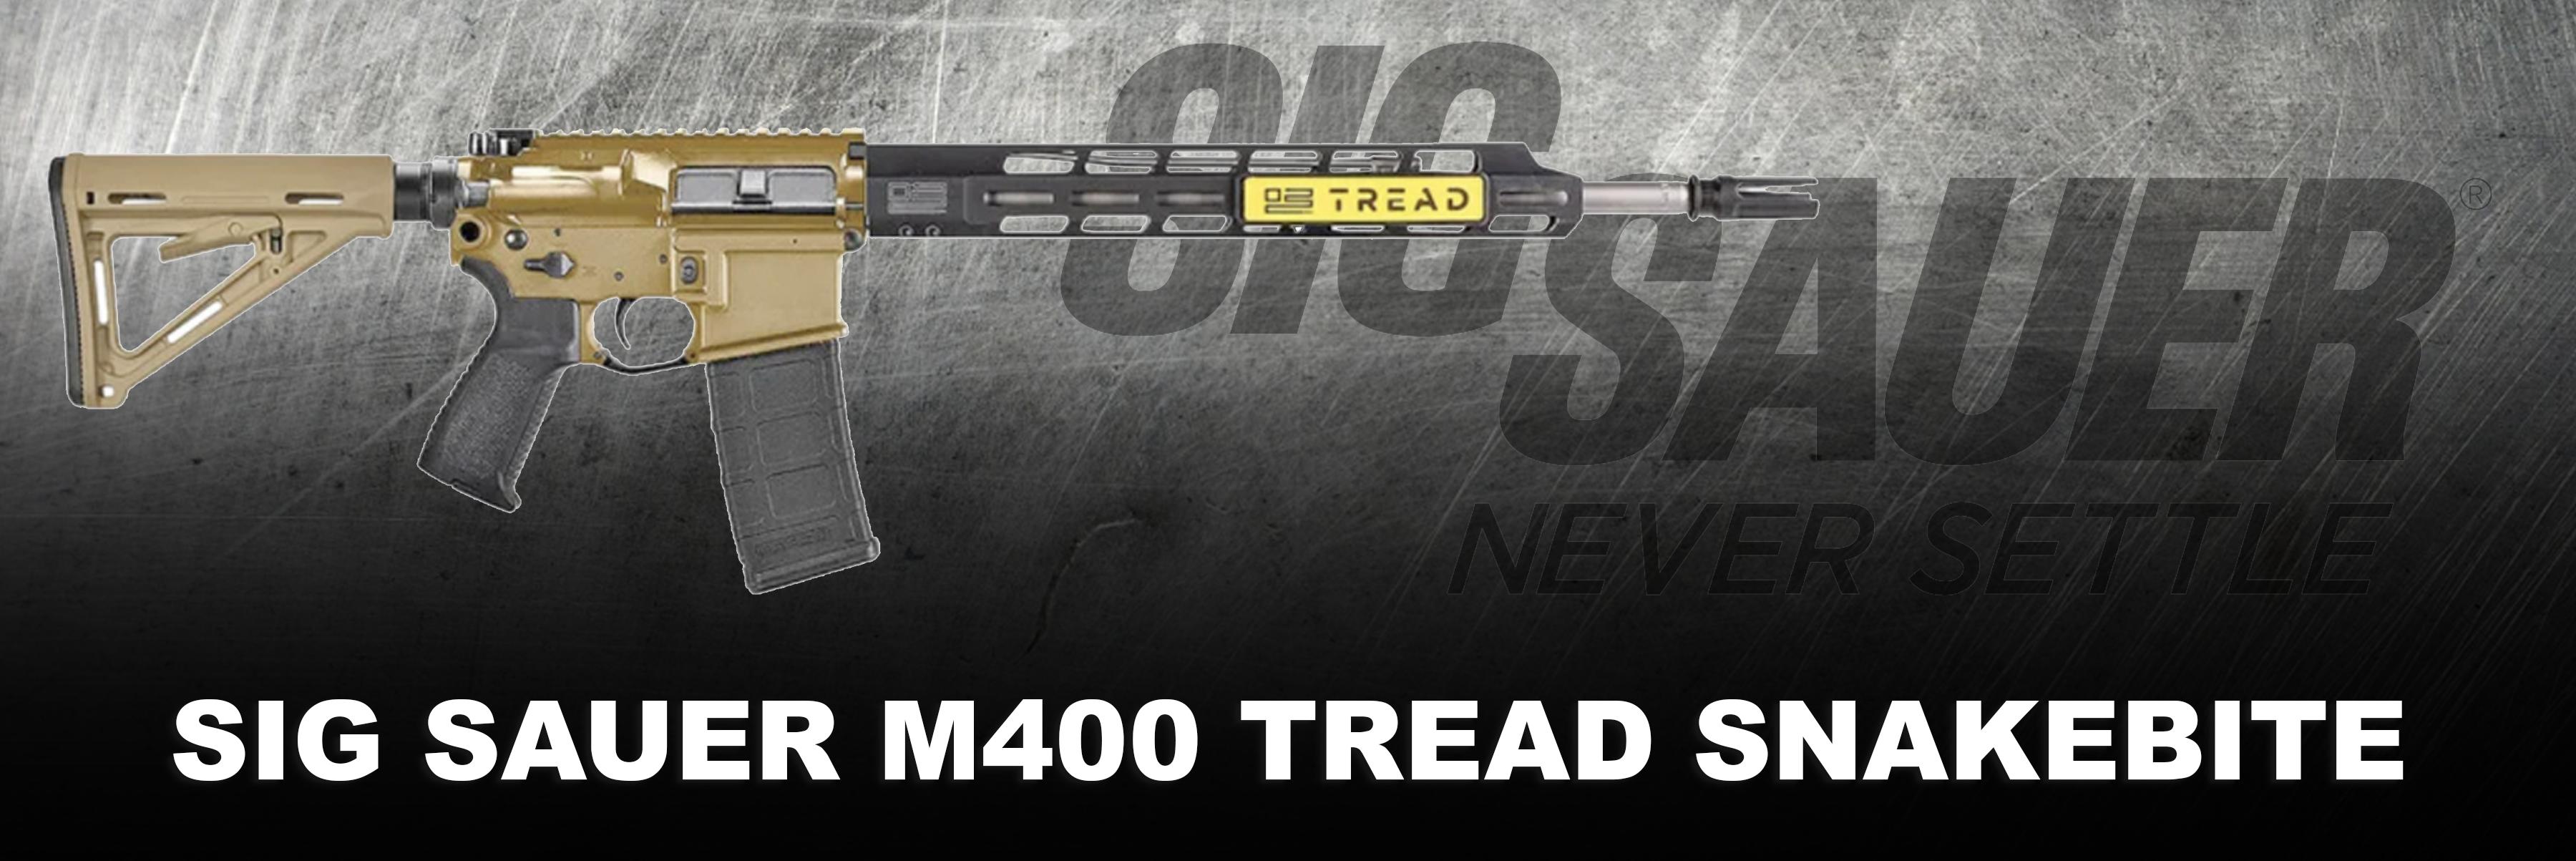 https://shop.rtsponline.com/products/rifles-sig-sauer-rm40016btrdsb-798681651726-4646